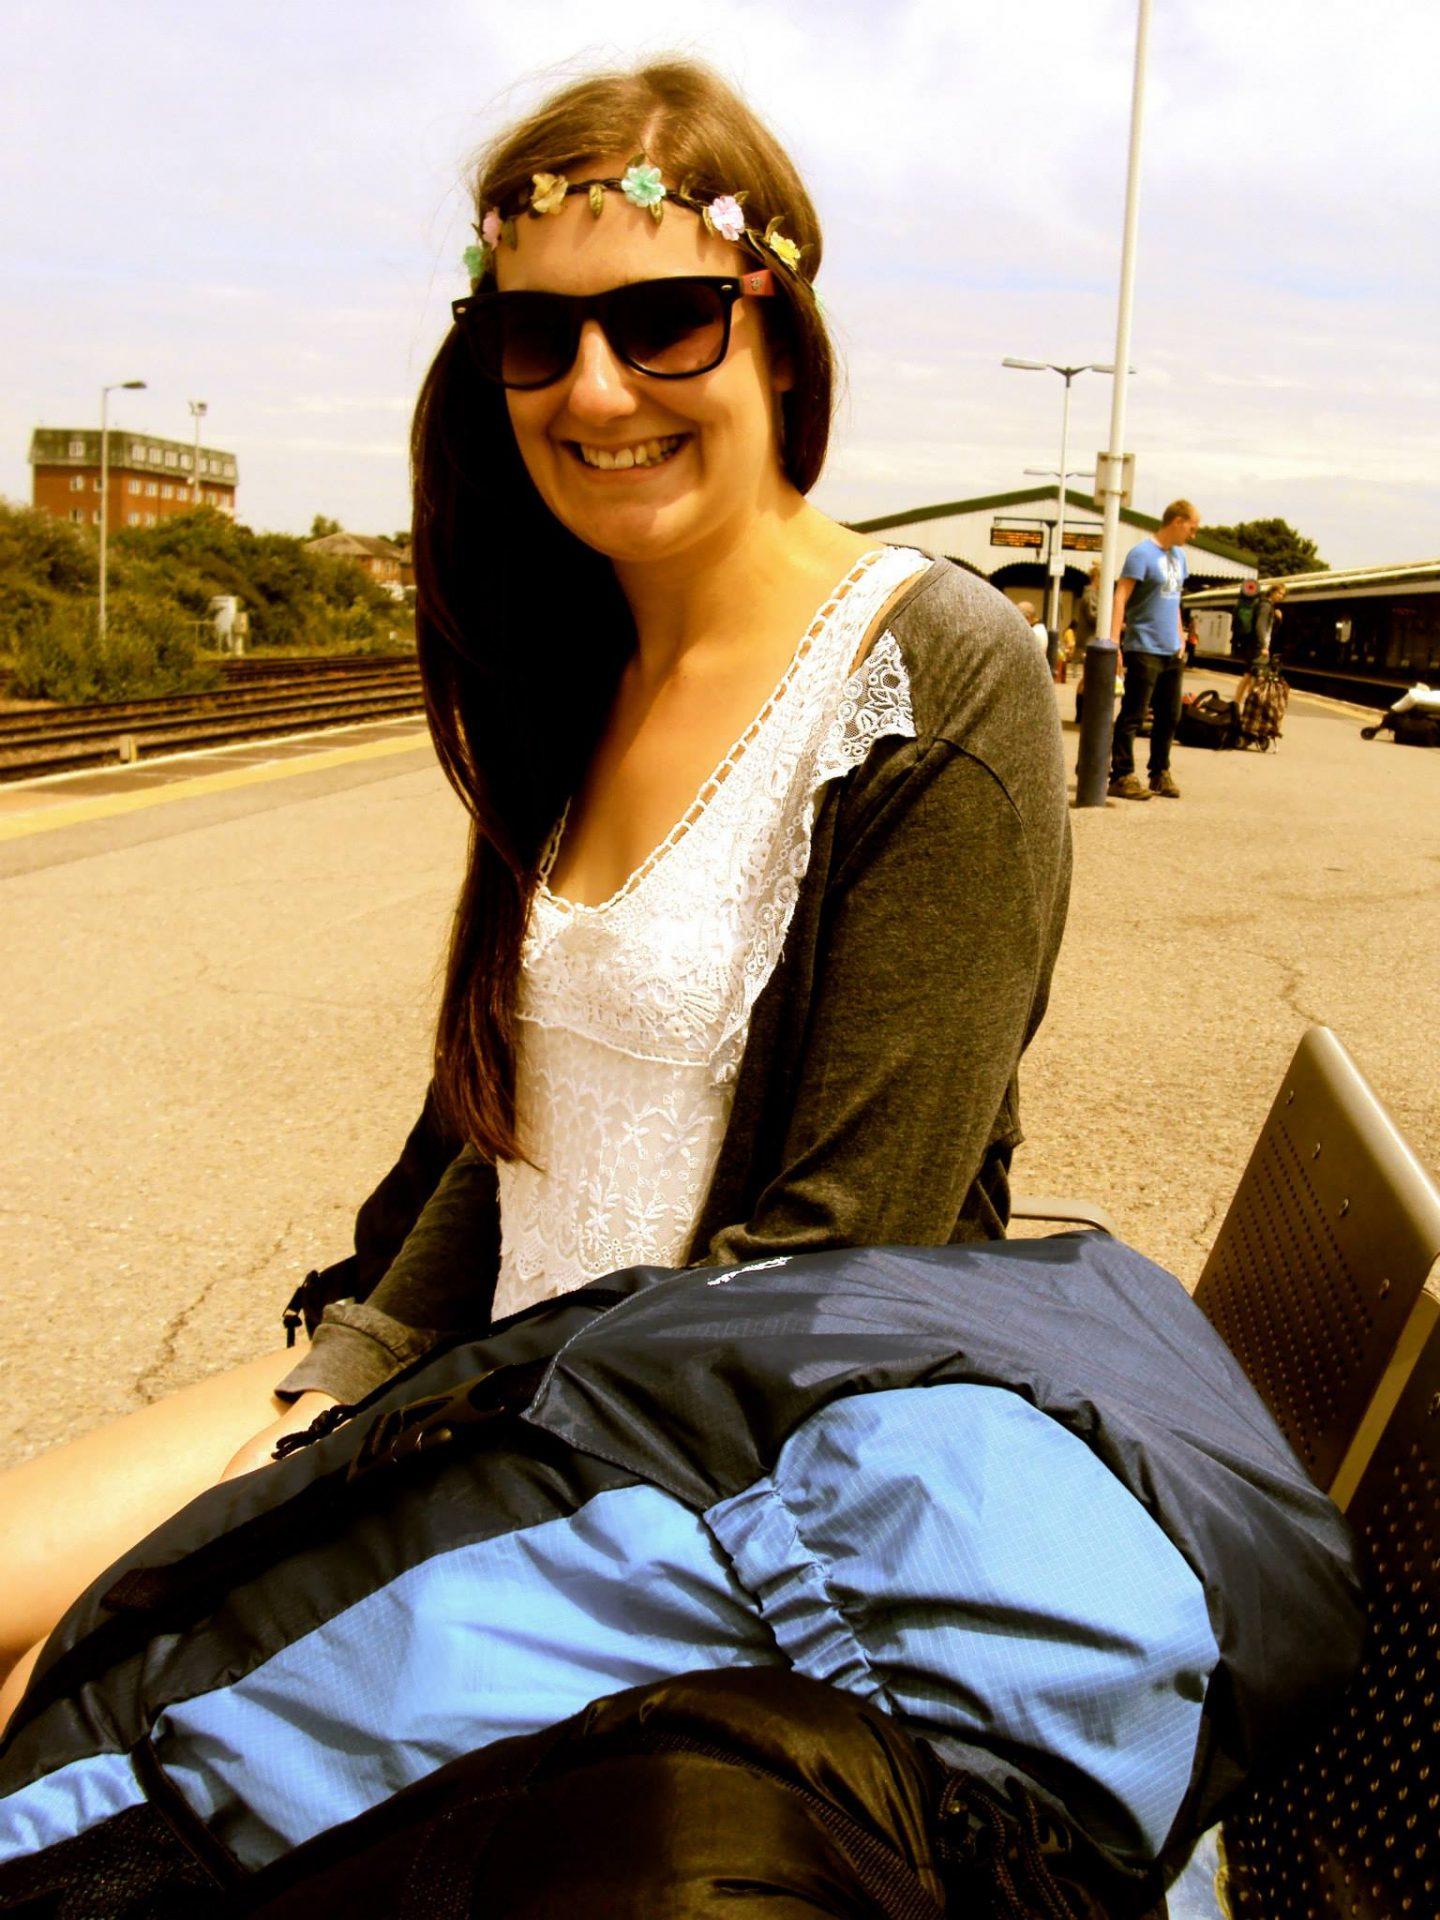 Jo travelling to Glastonbury